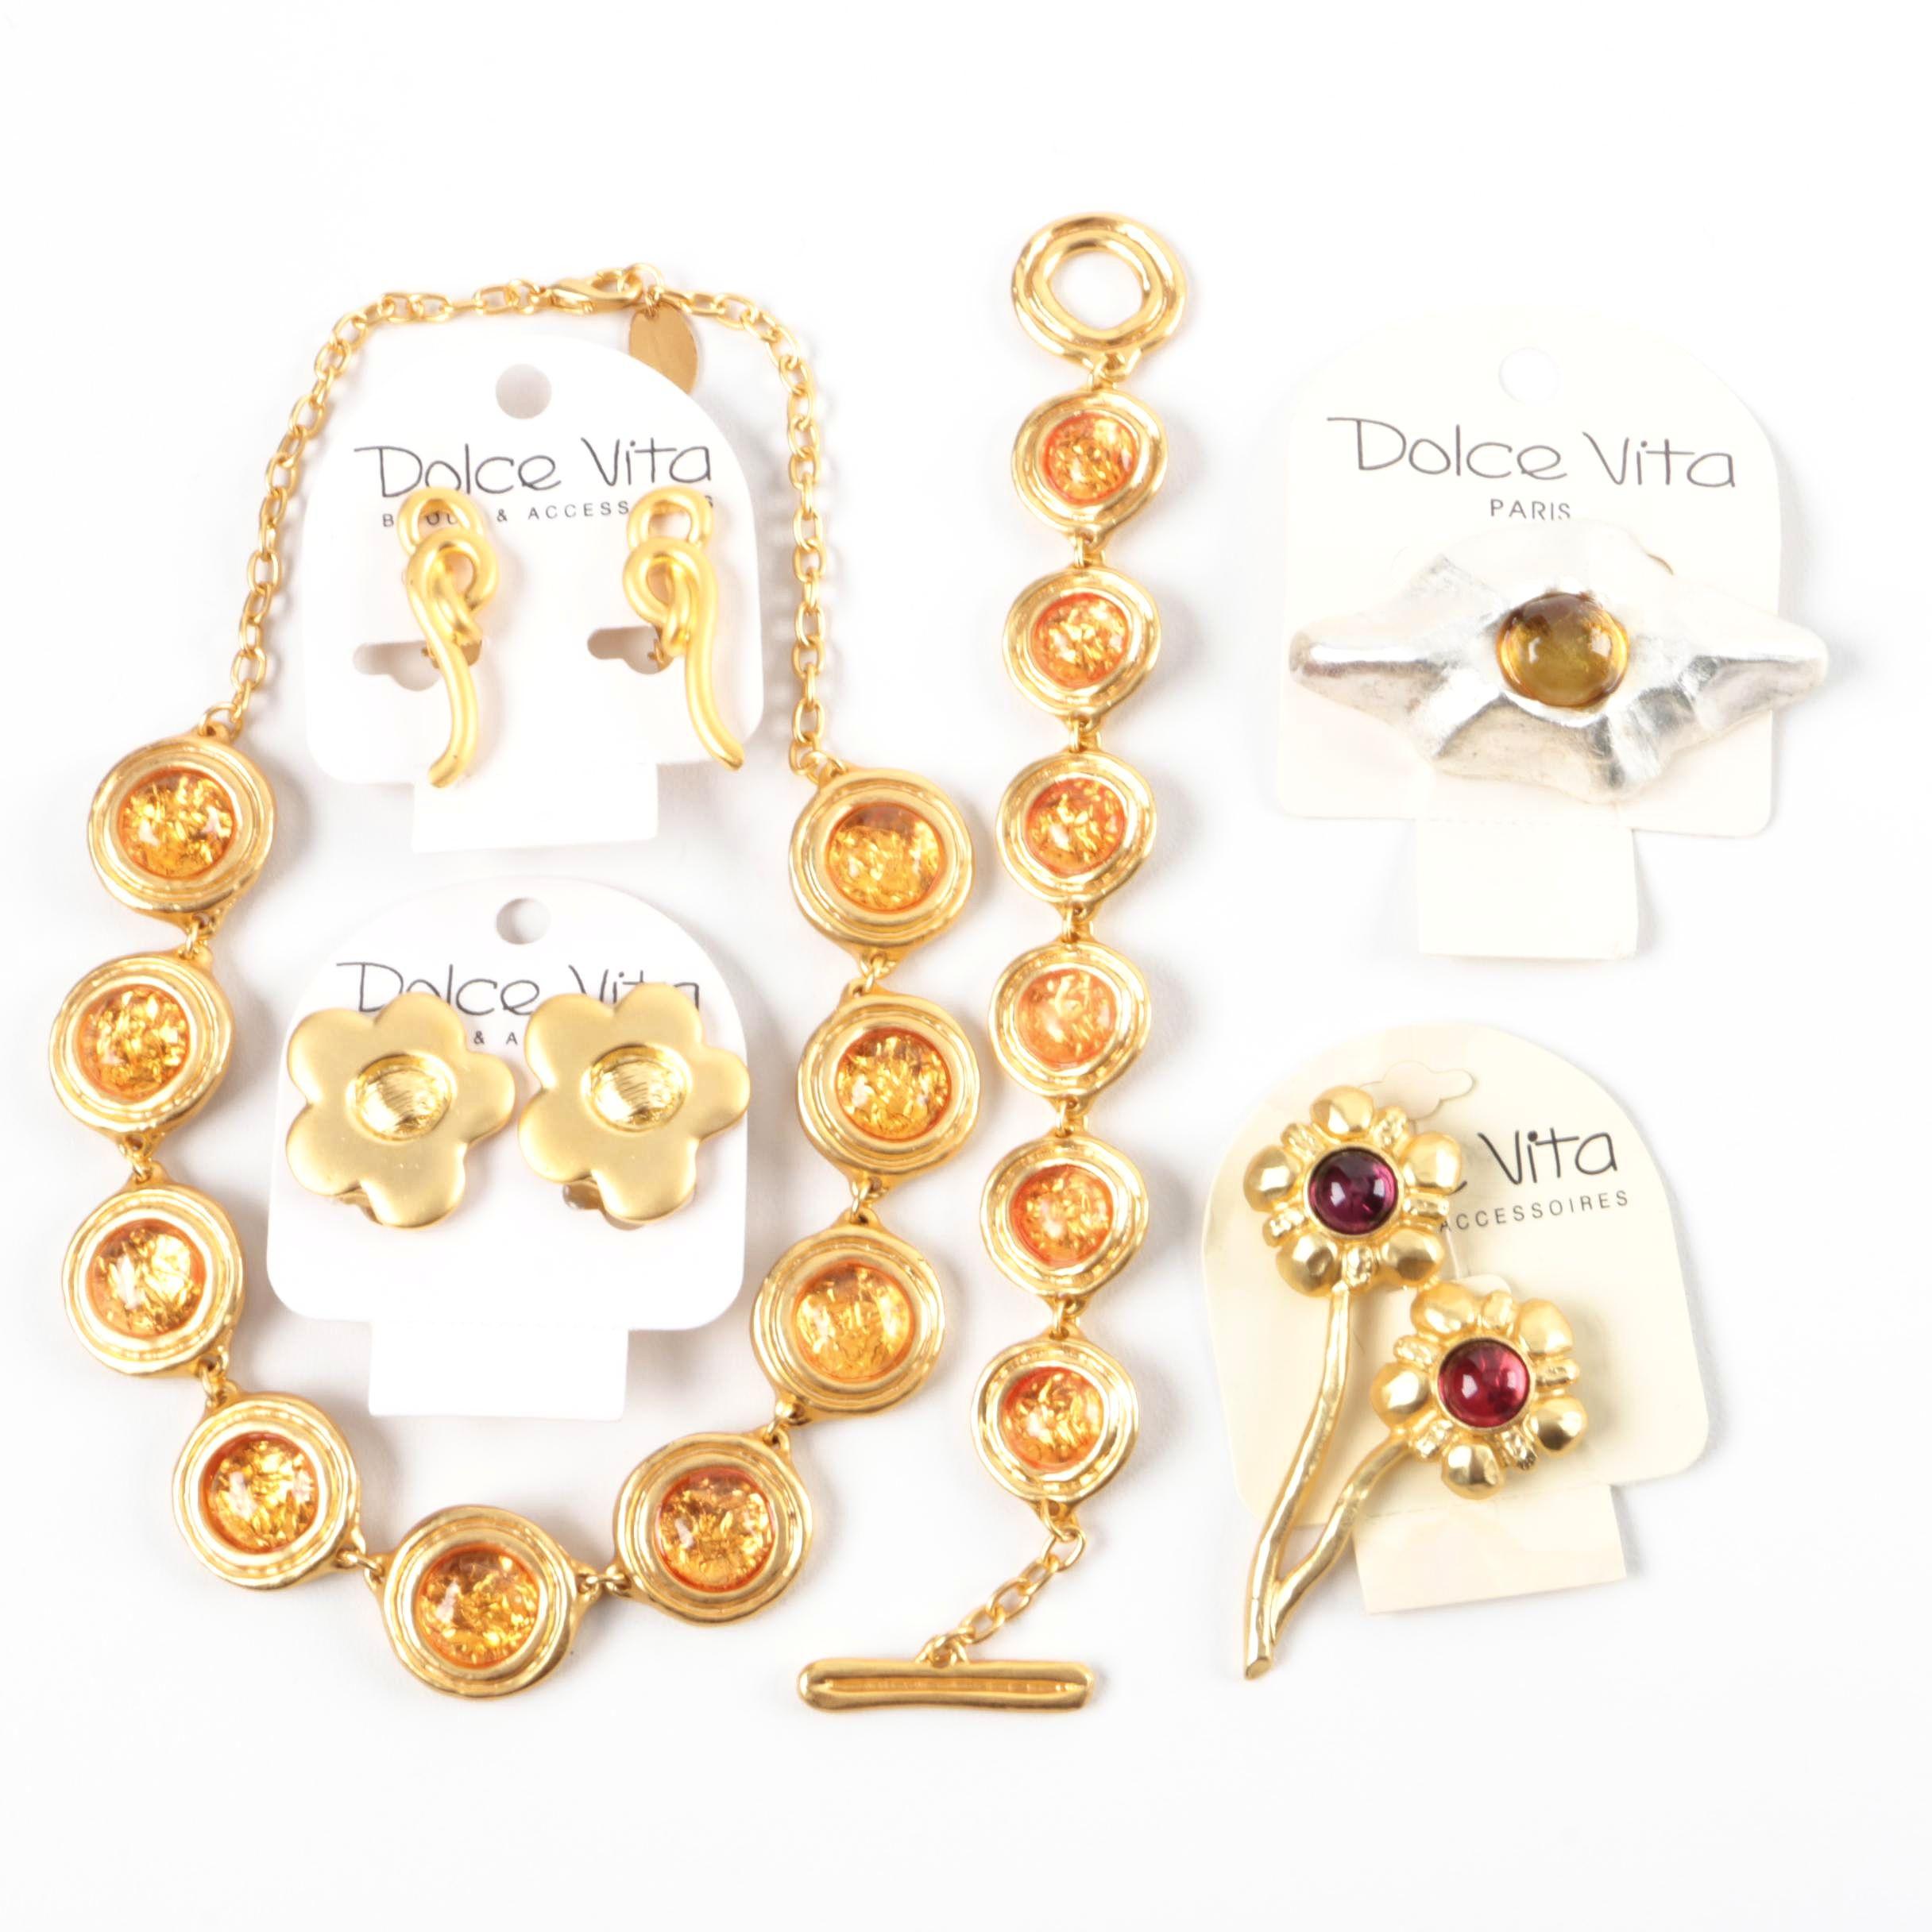 Paris Dolce Vita Jewelry set